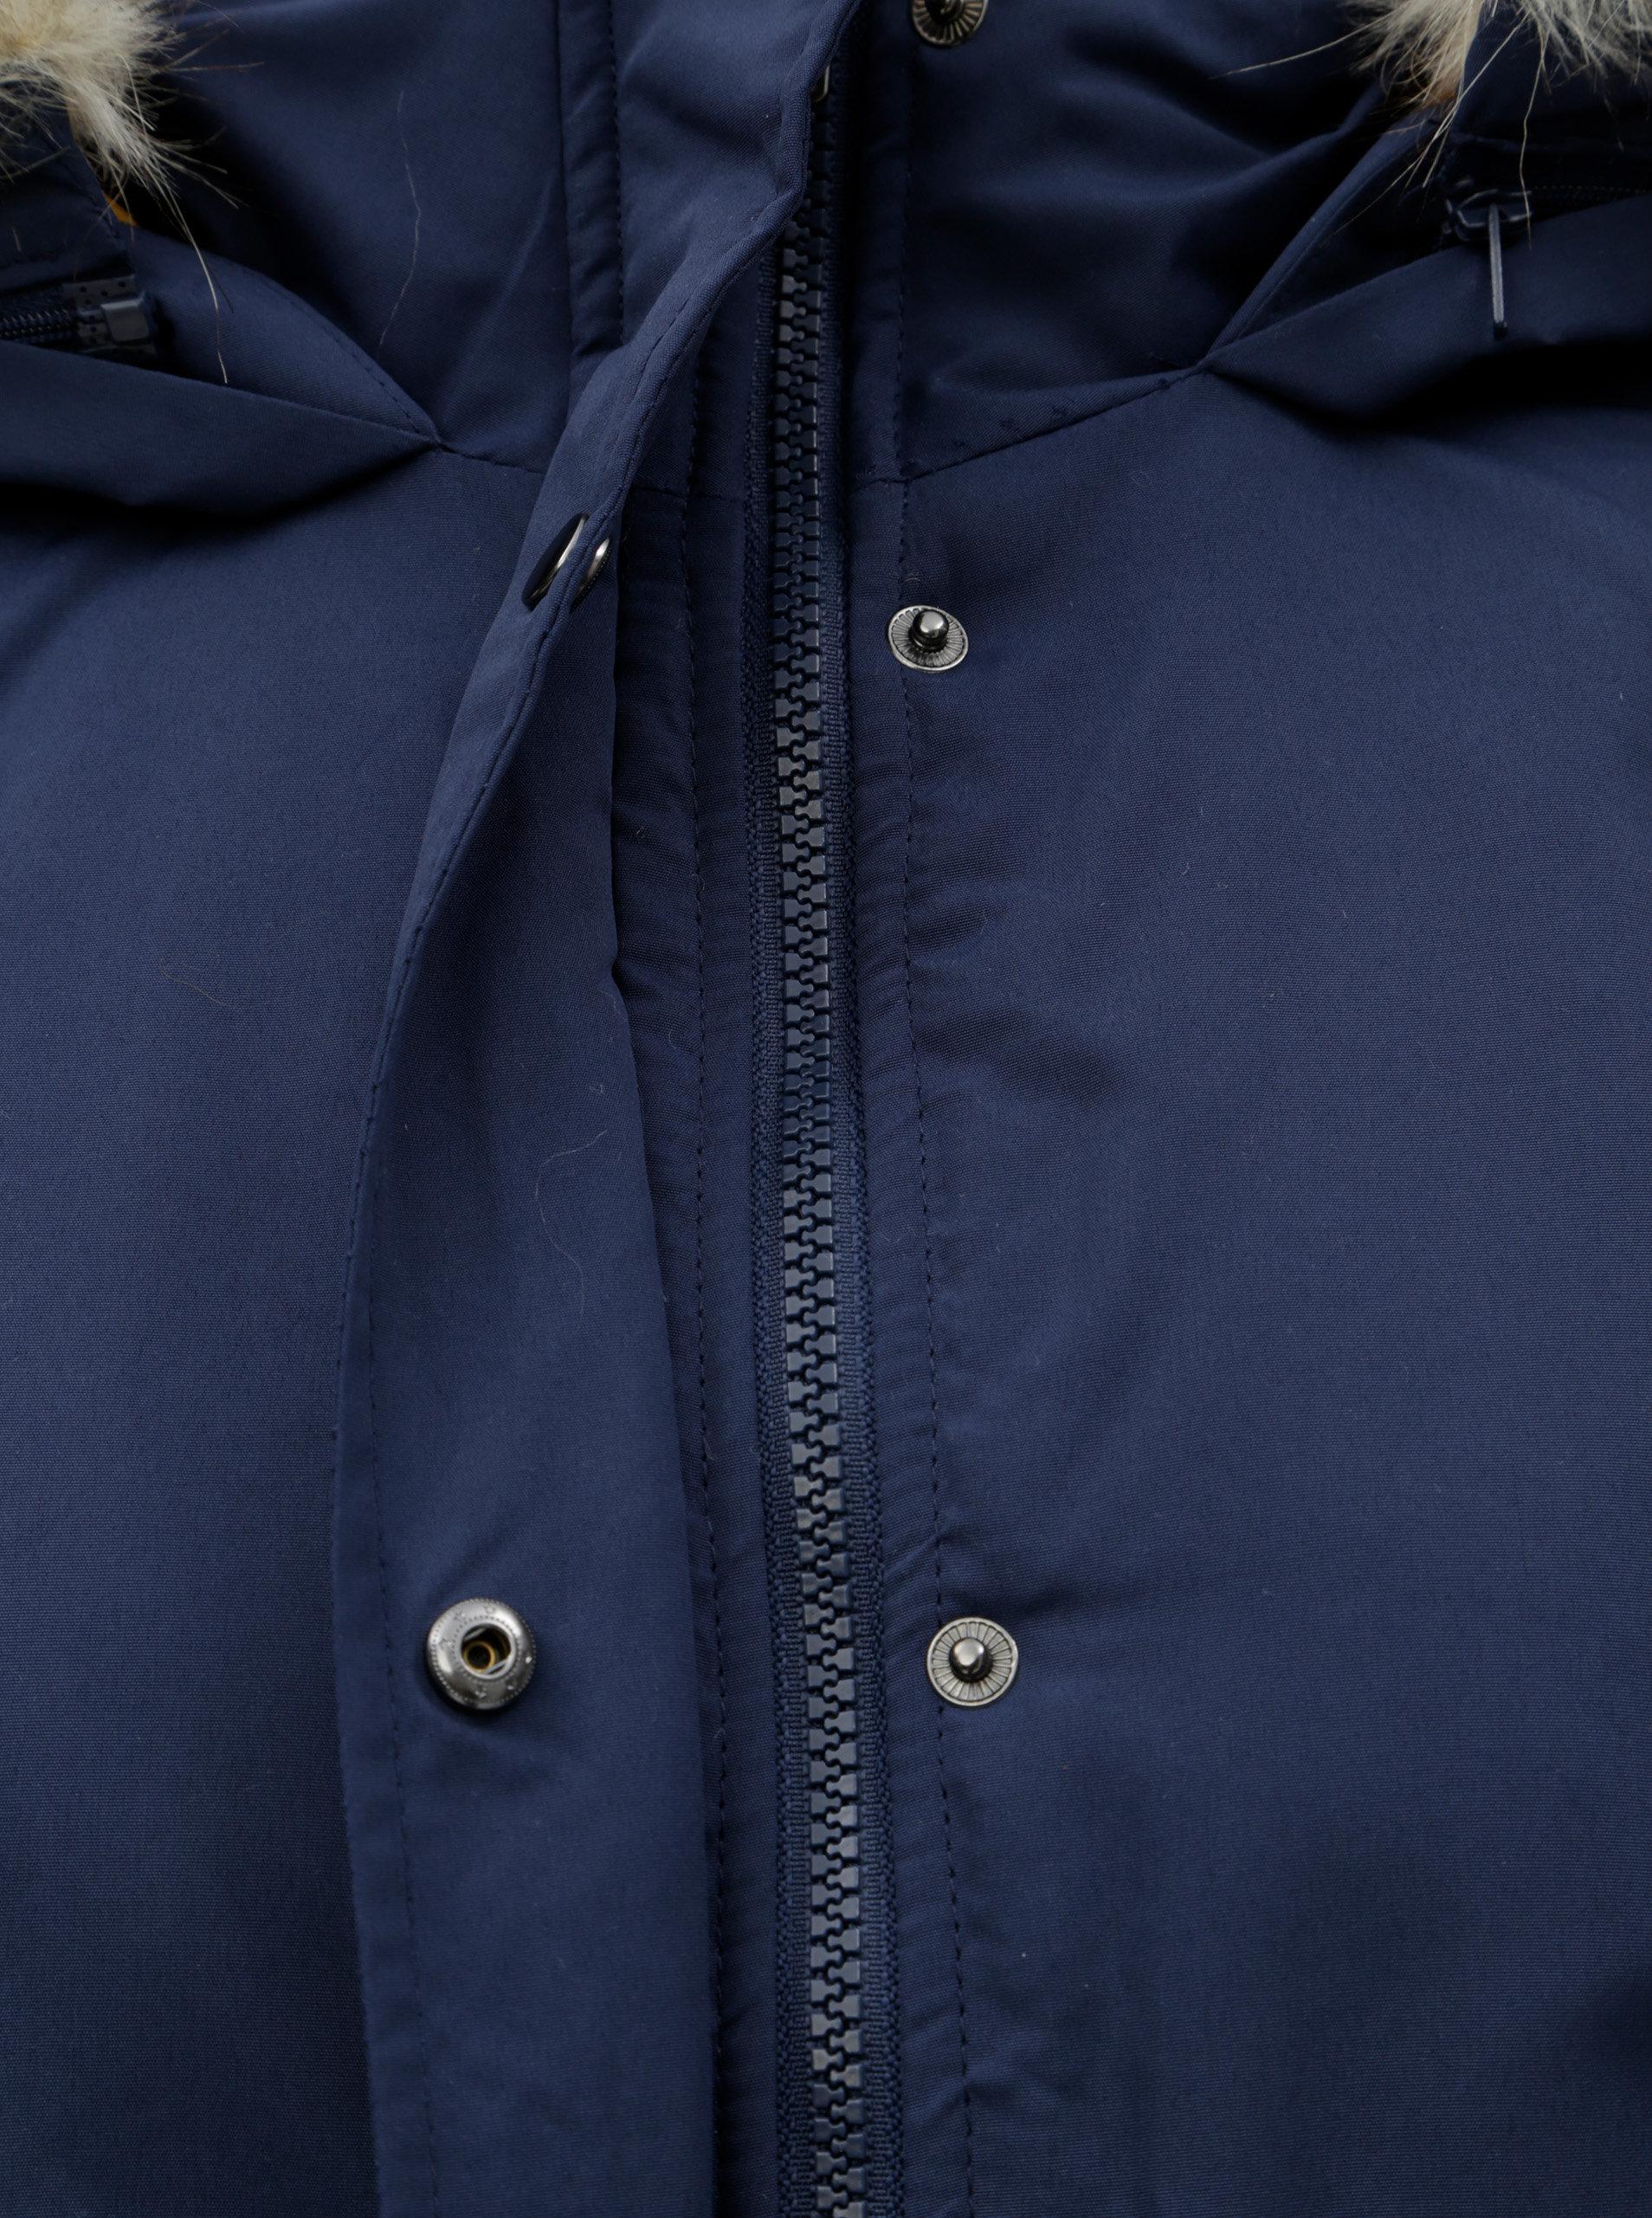 bc292e73dd0e Tmavomodrá dlhá zimná bunda Jacqueline de Yong Star ...